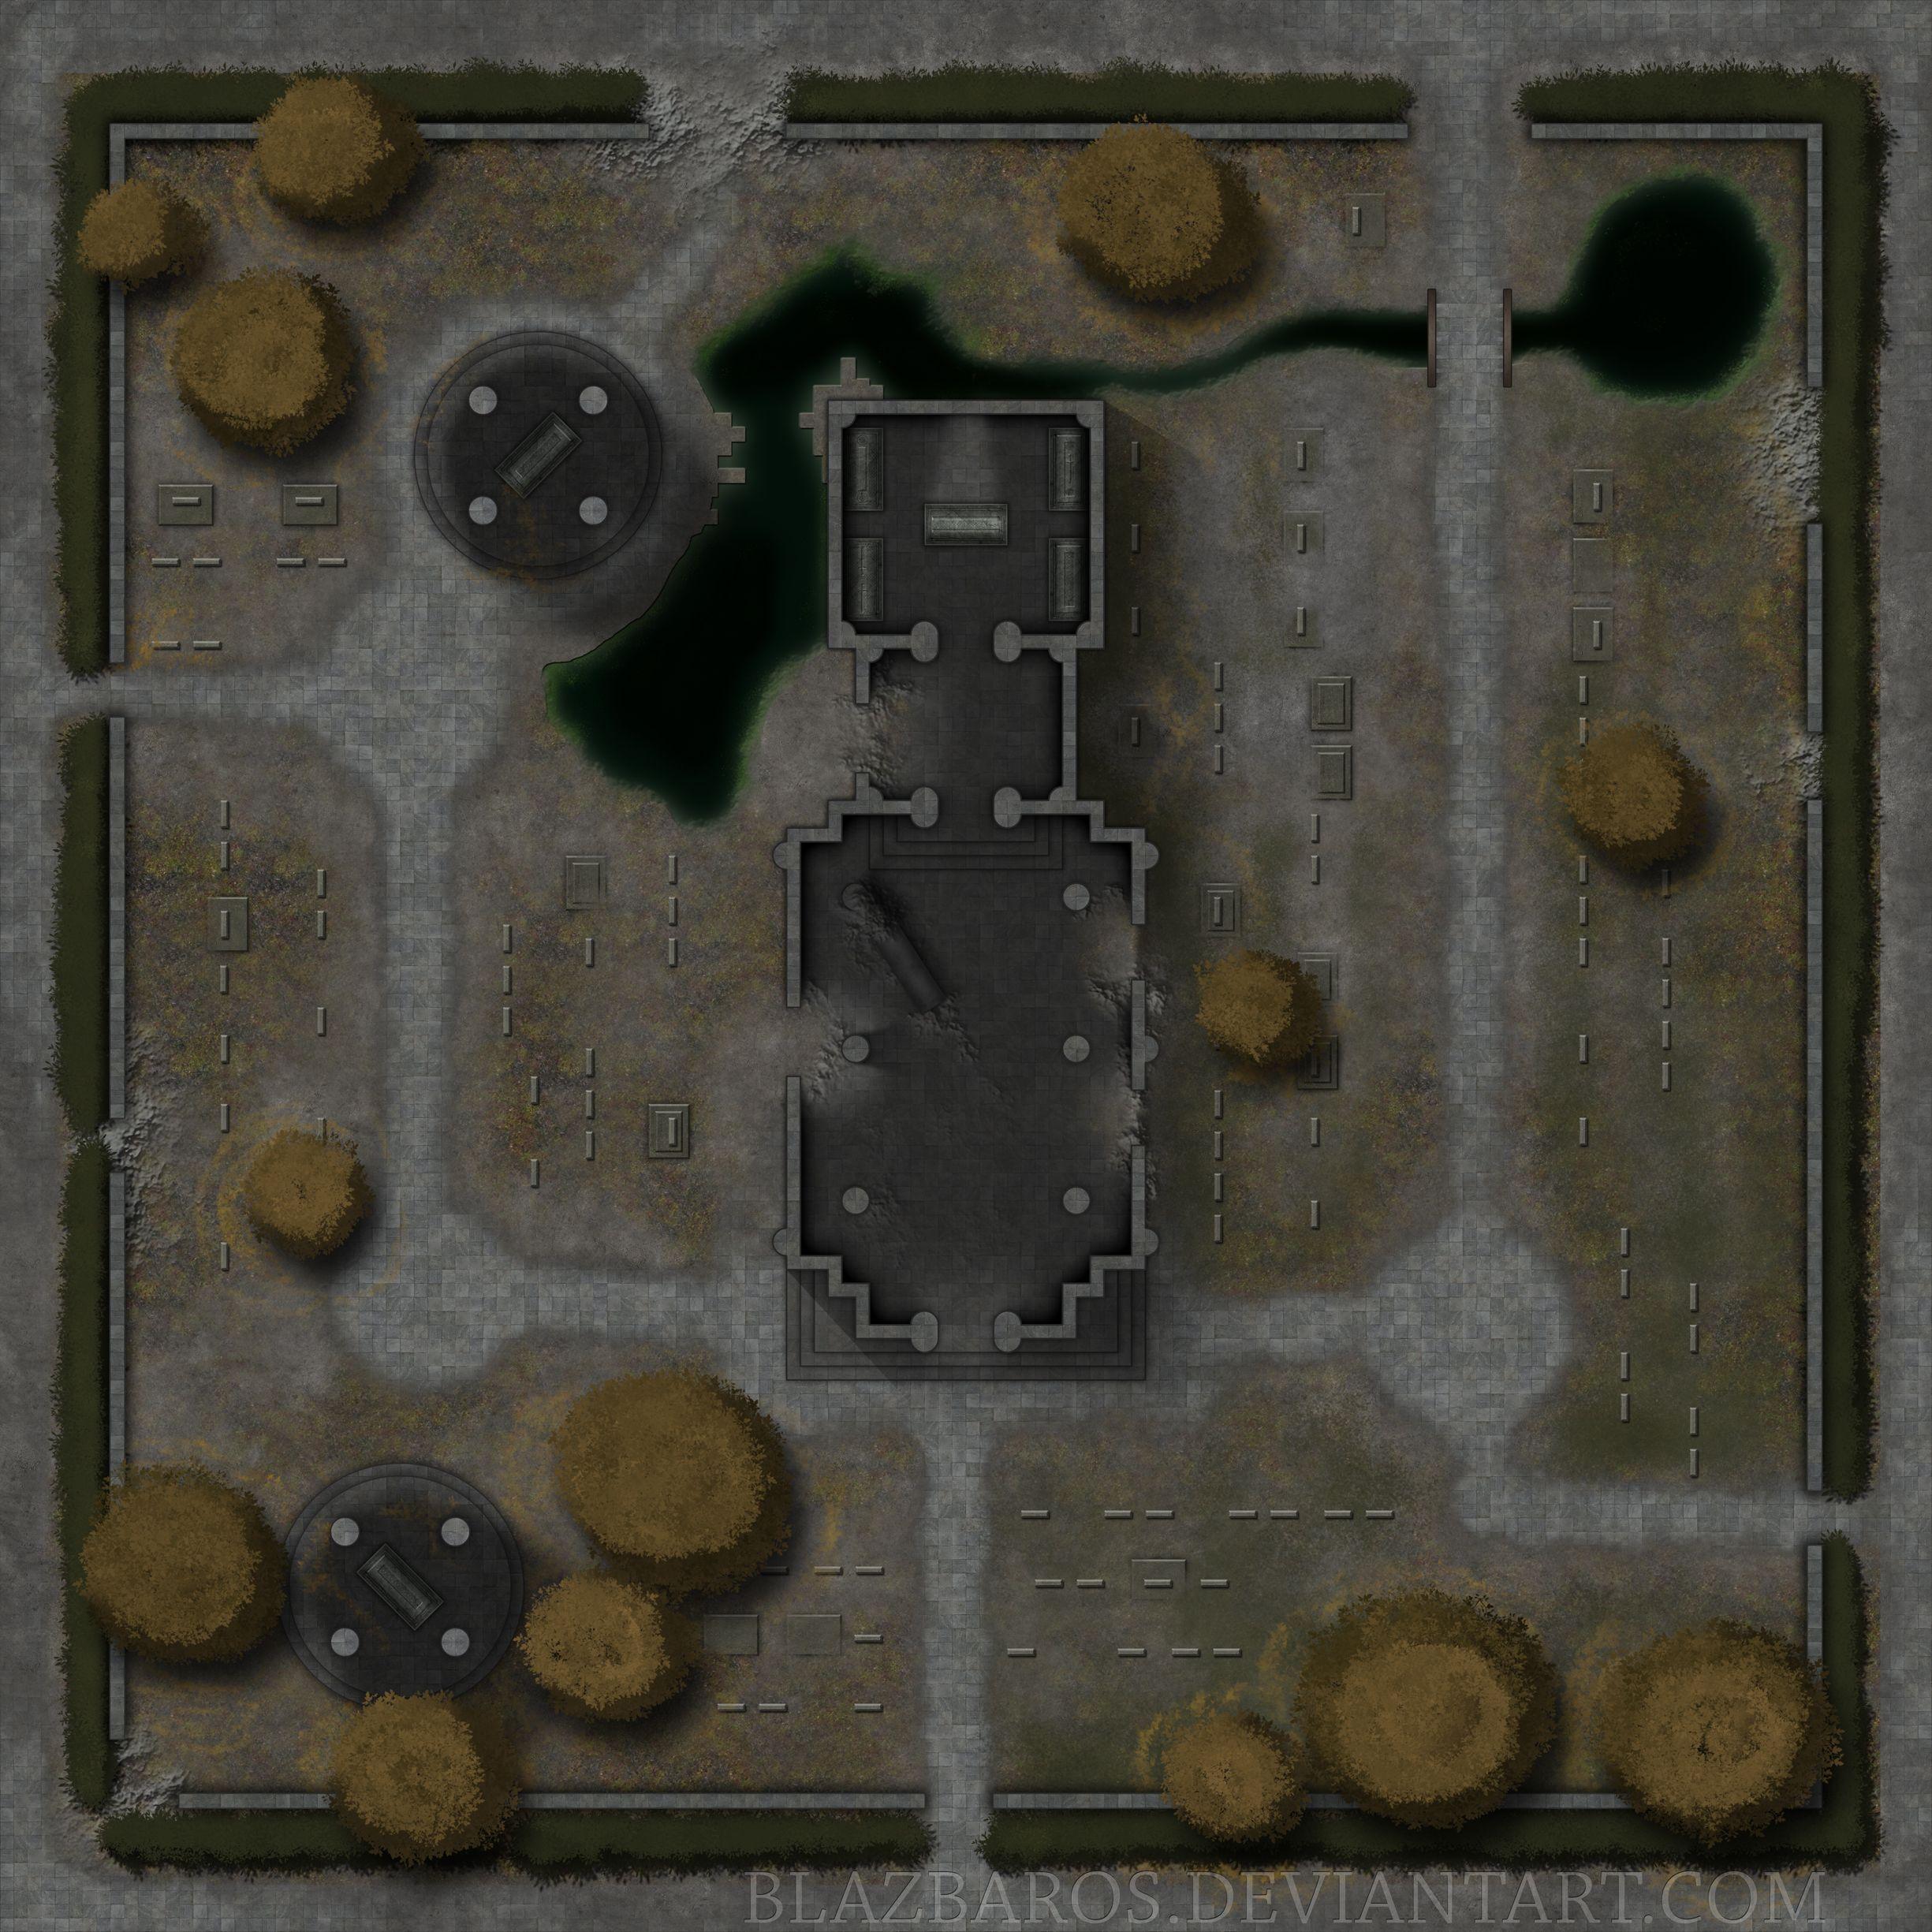 Mordheim Map 2: The Cemetary By Blazbaros.deviantart.com